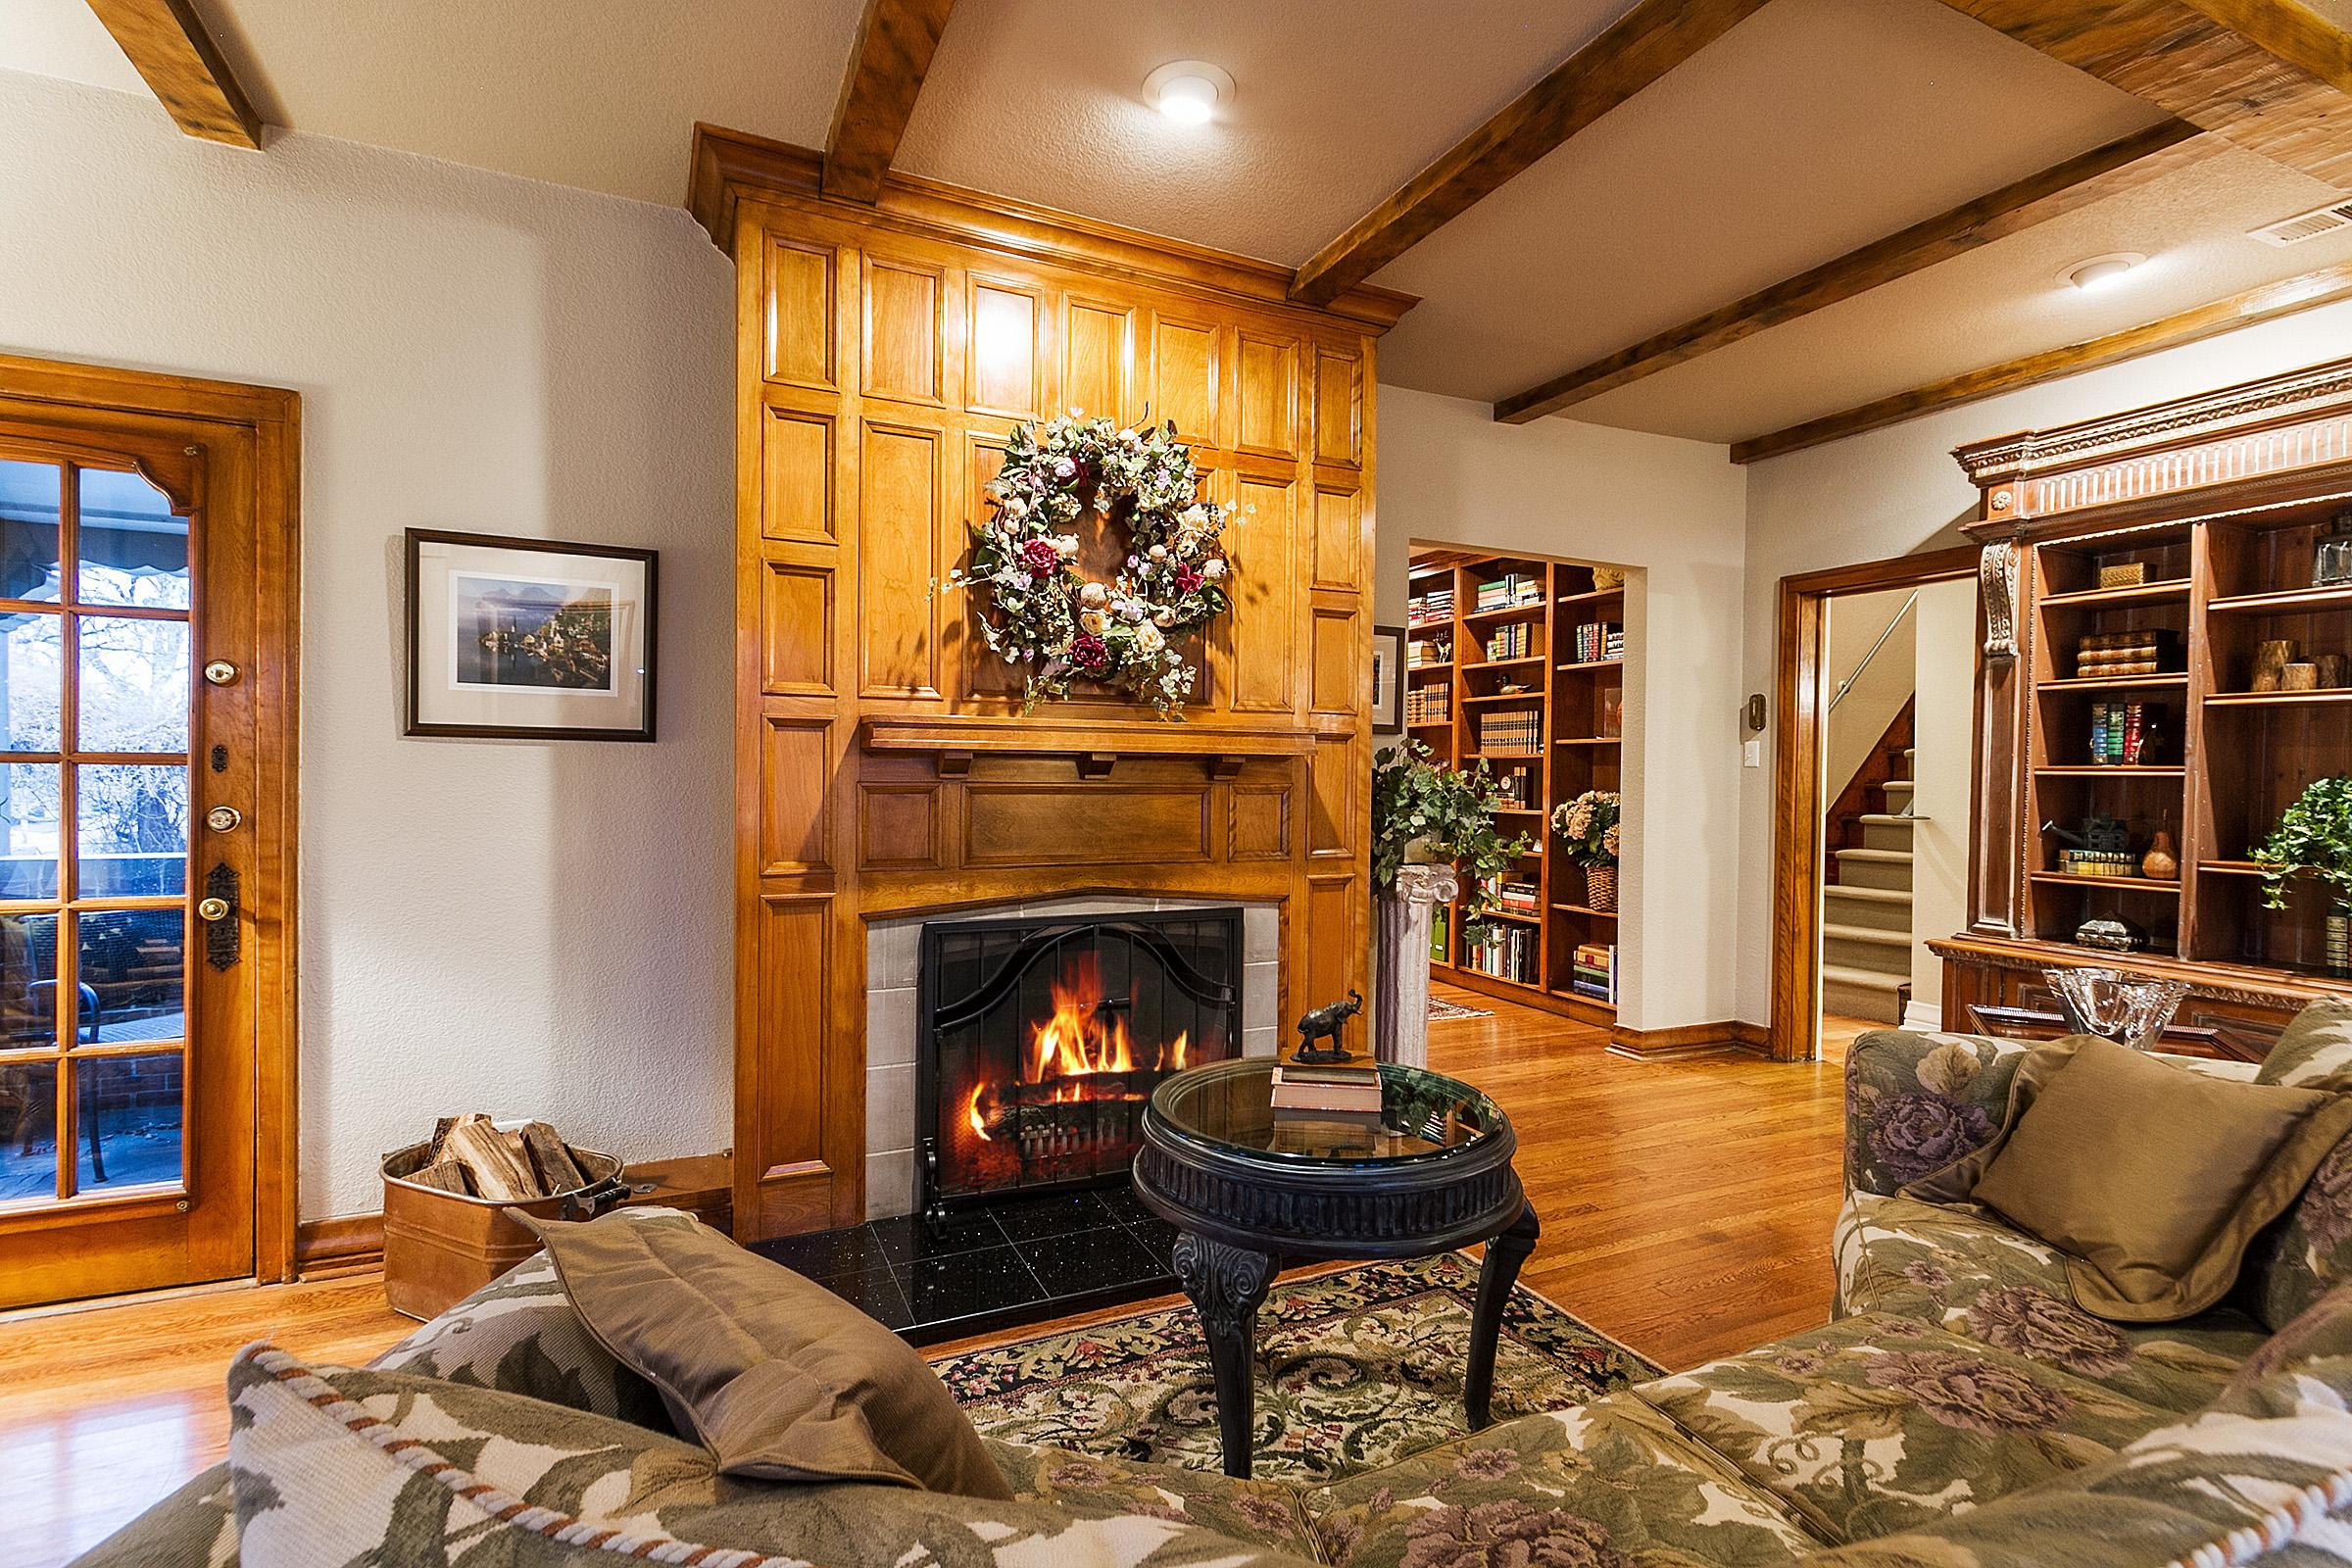 1183145_Paneled-Fireplace-with-Gas-Logs_high.jpg